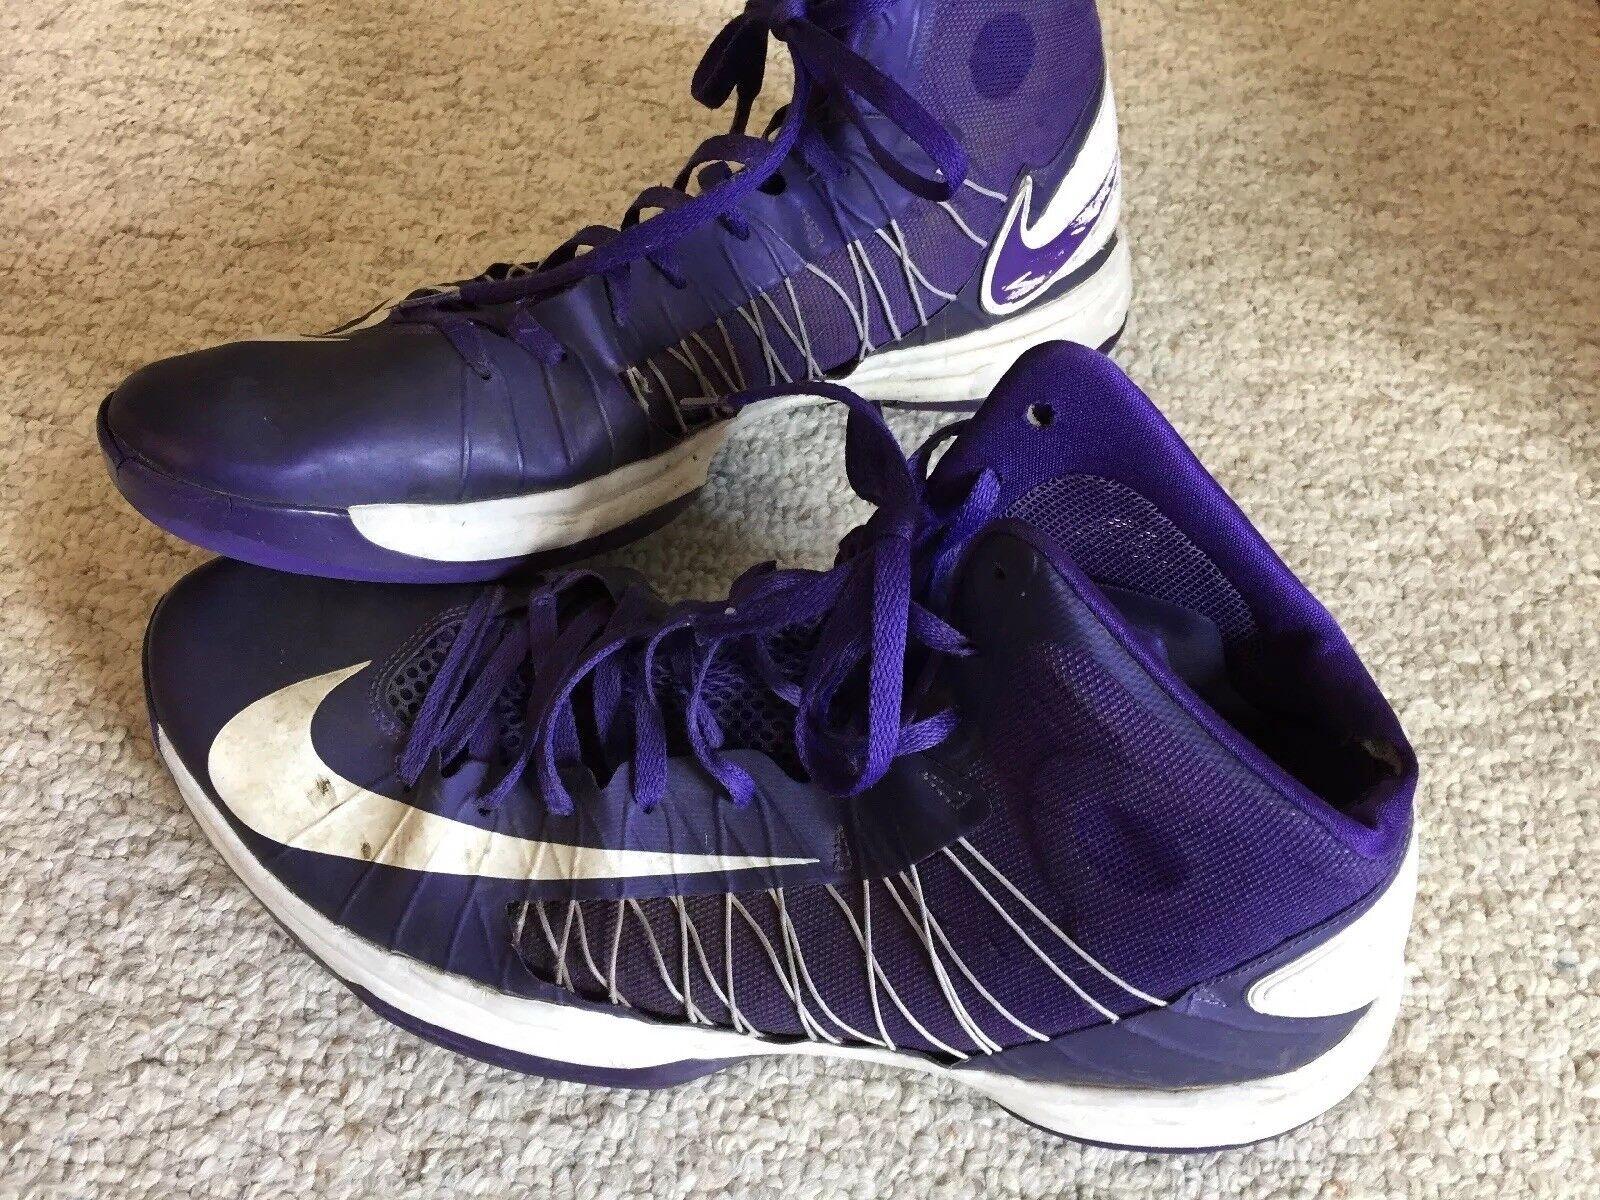 NIKE Hyperdunk Basketball TB Purple White Size 17 High Tops Basketball Hyperdunk Shoes 524882 500 d56e5c